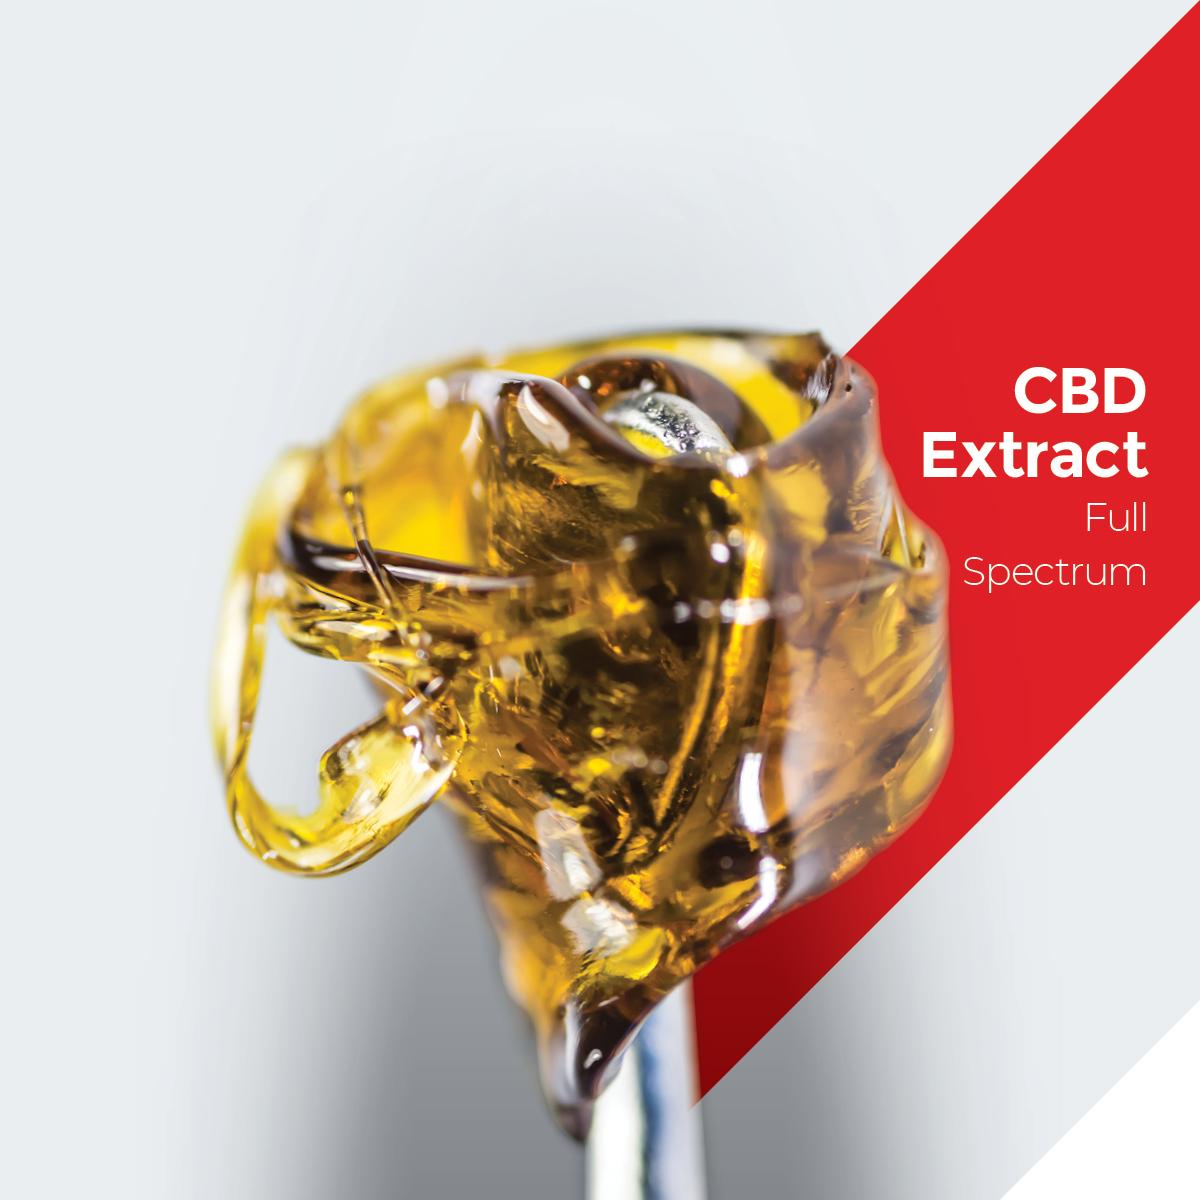 CBD Extract FUll-Spectrum